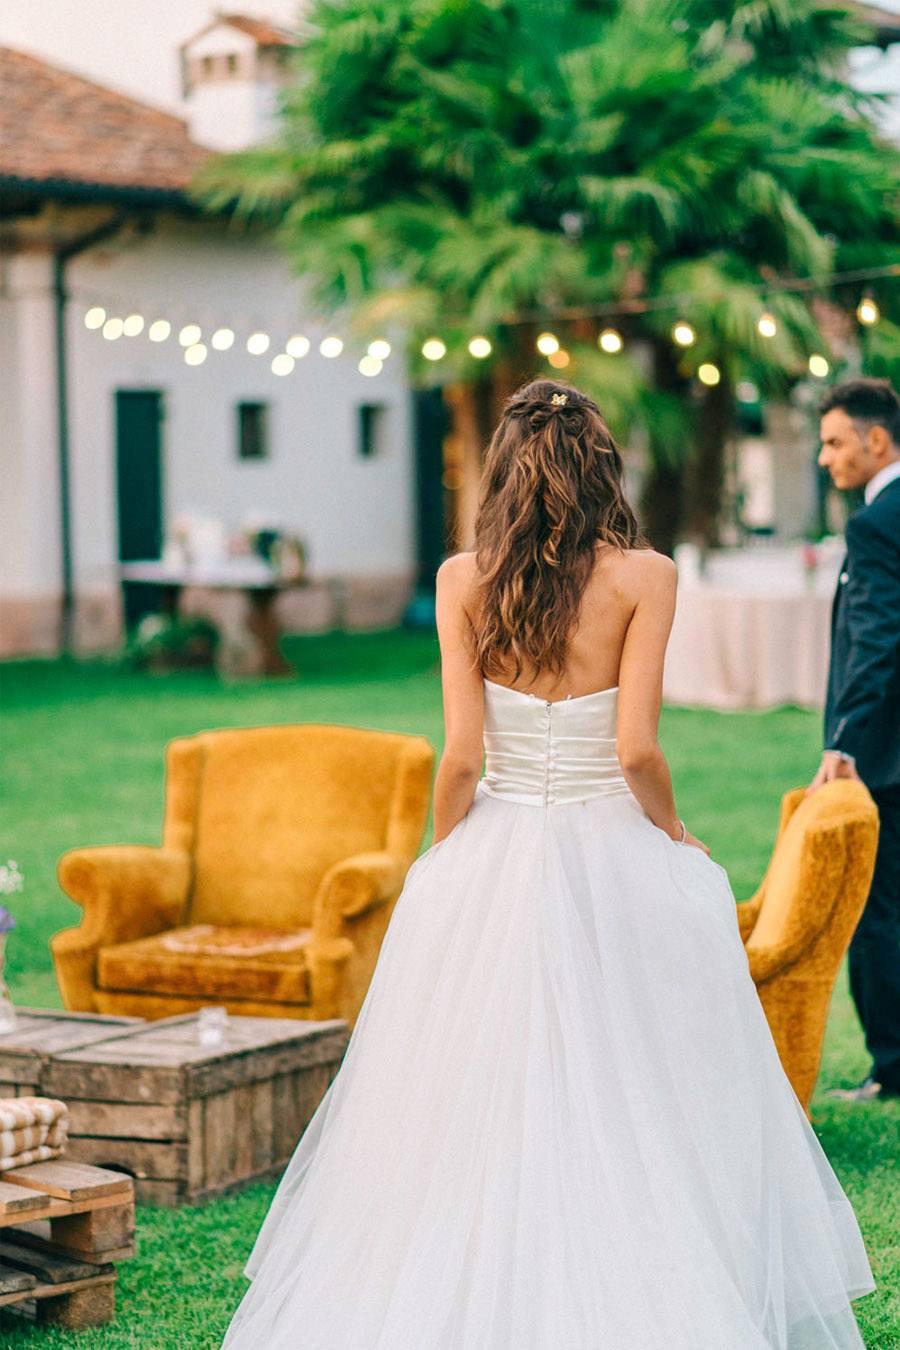 LIALA, ANDREAS Y SU PRECIOSA BODA ITALIANA novios-boda-aire-libre